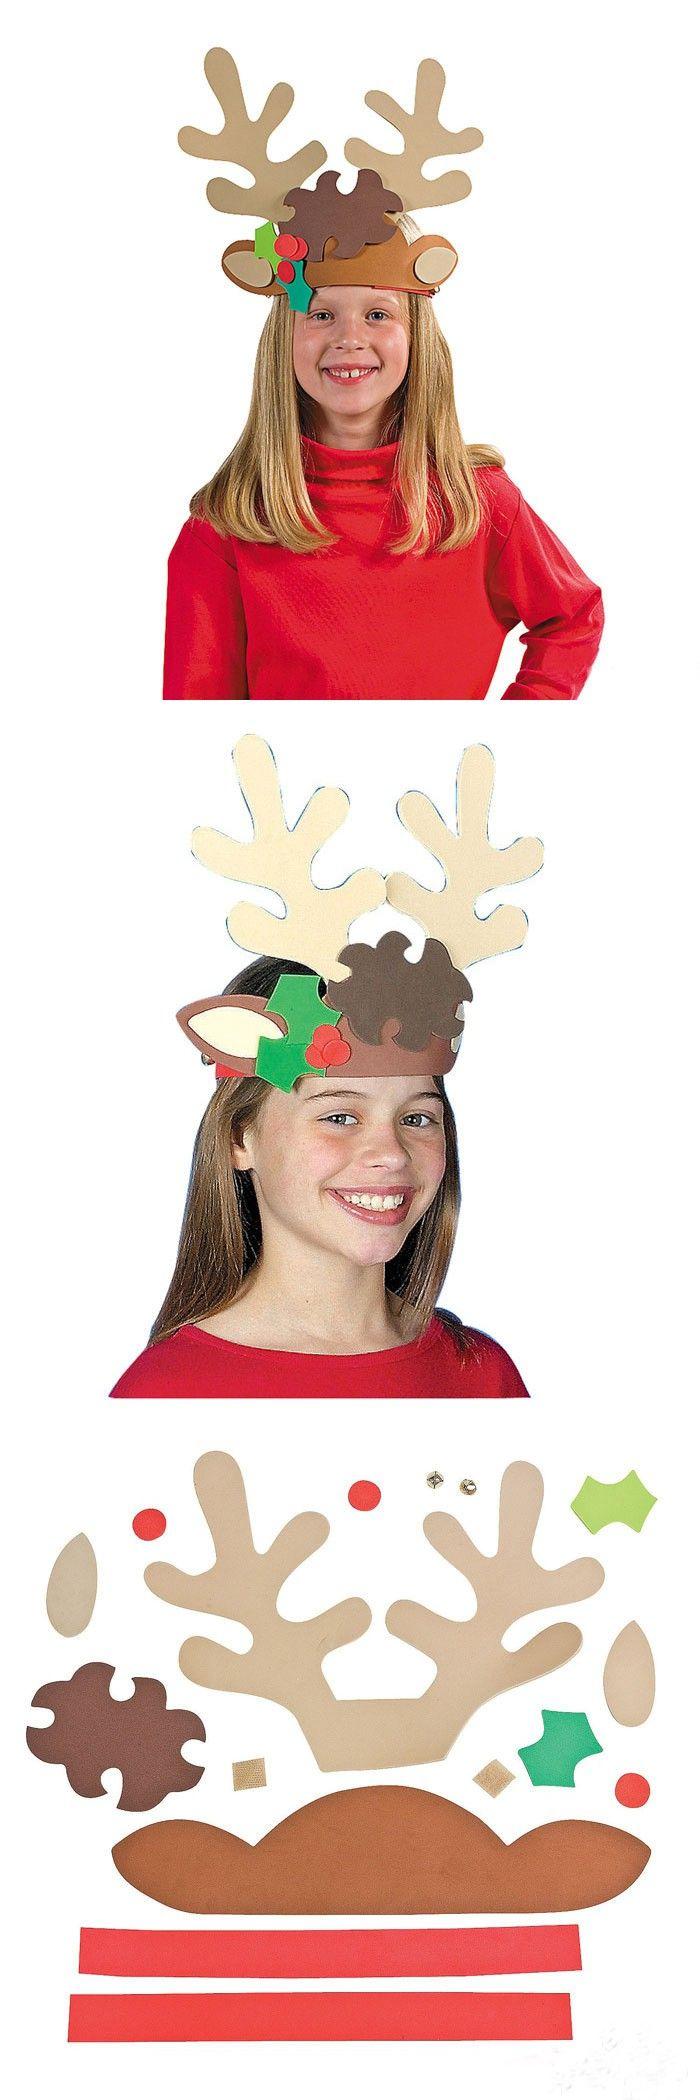 12PCS/LOT.DIY foam christmas elk antlers craft kits,Model building kits.Early educational toys.Kids toys.Kindergarten crafts.